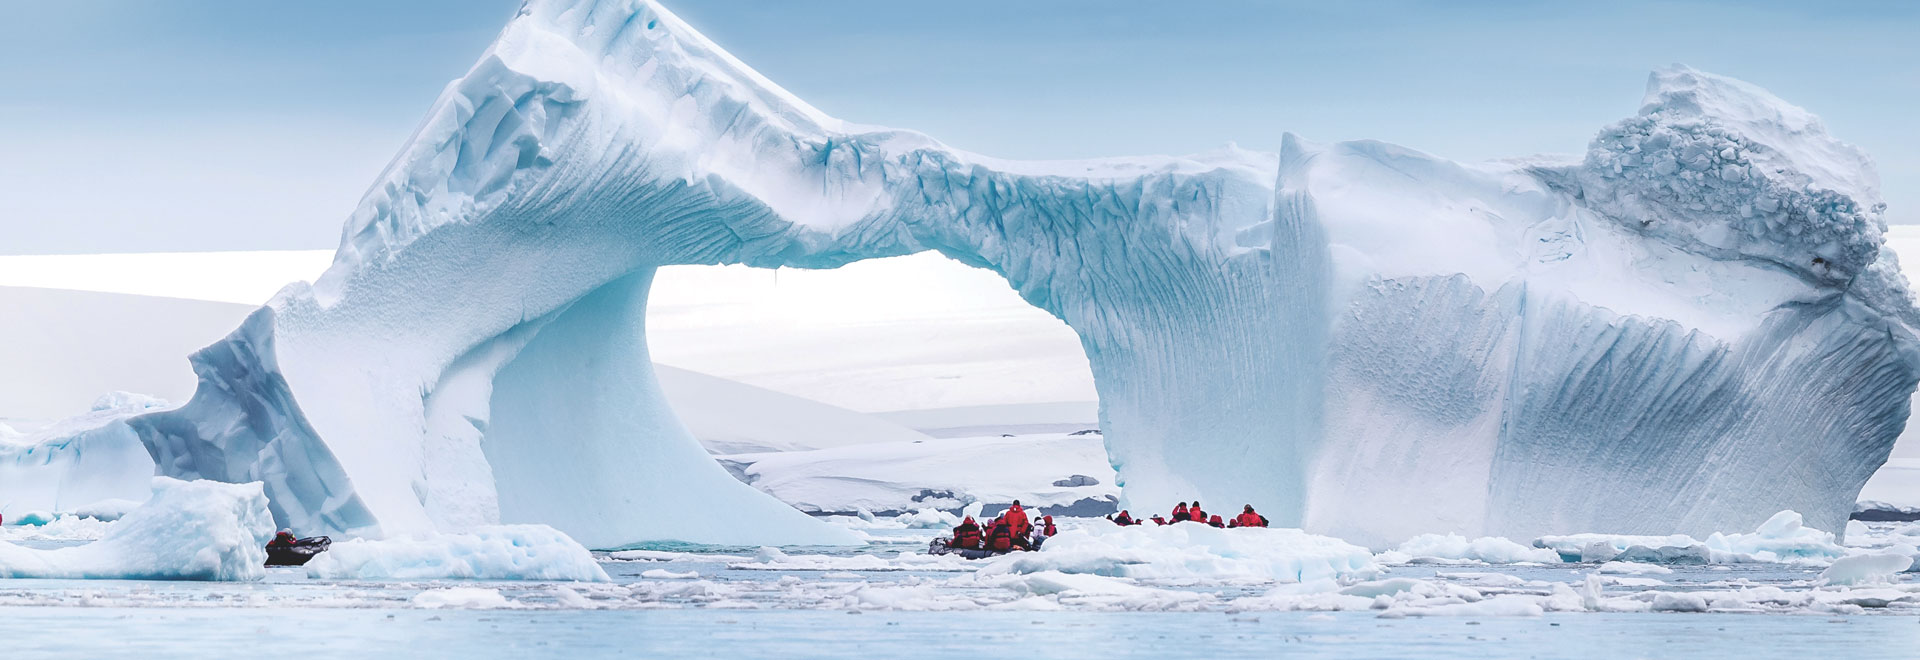 Antarctica-ClassicAntarctica-Zodiac-Iceberg-MH